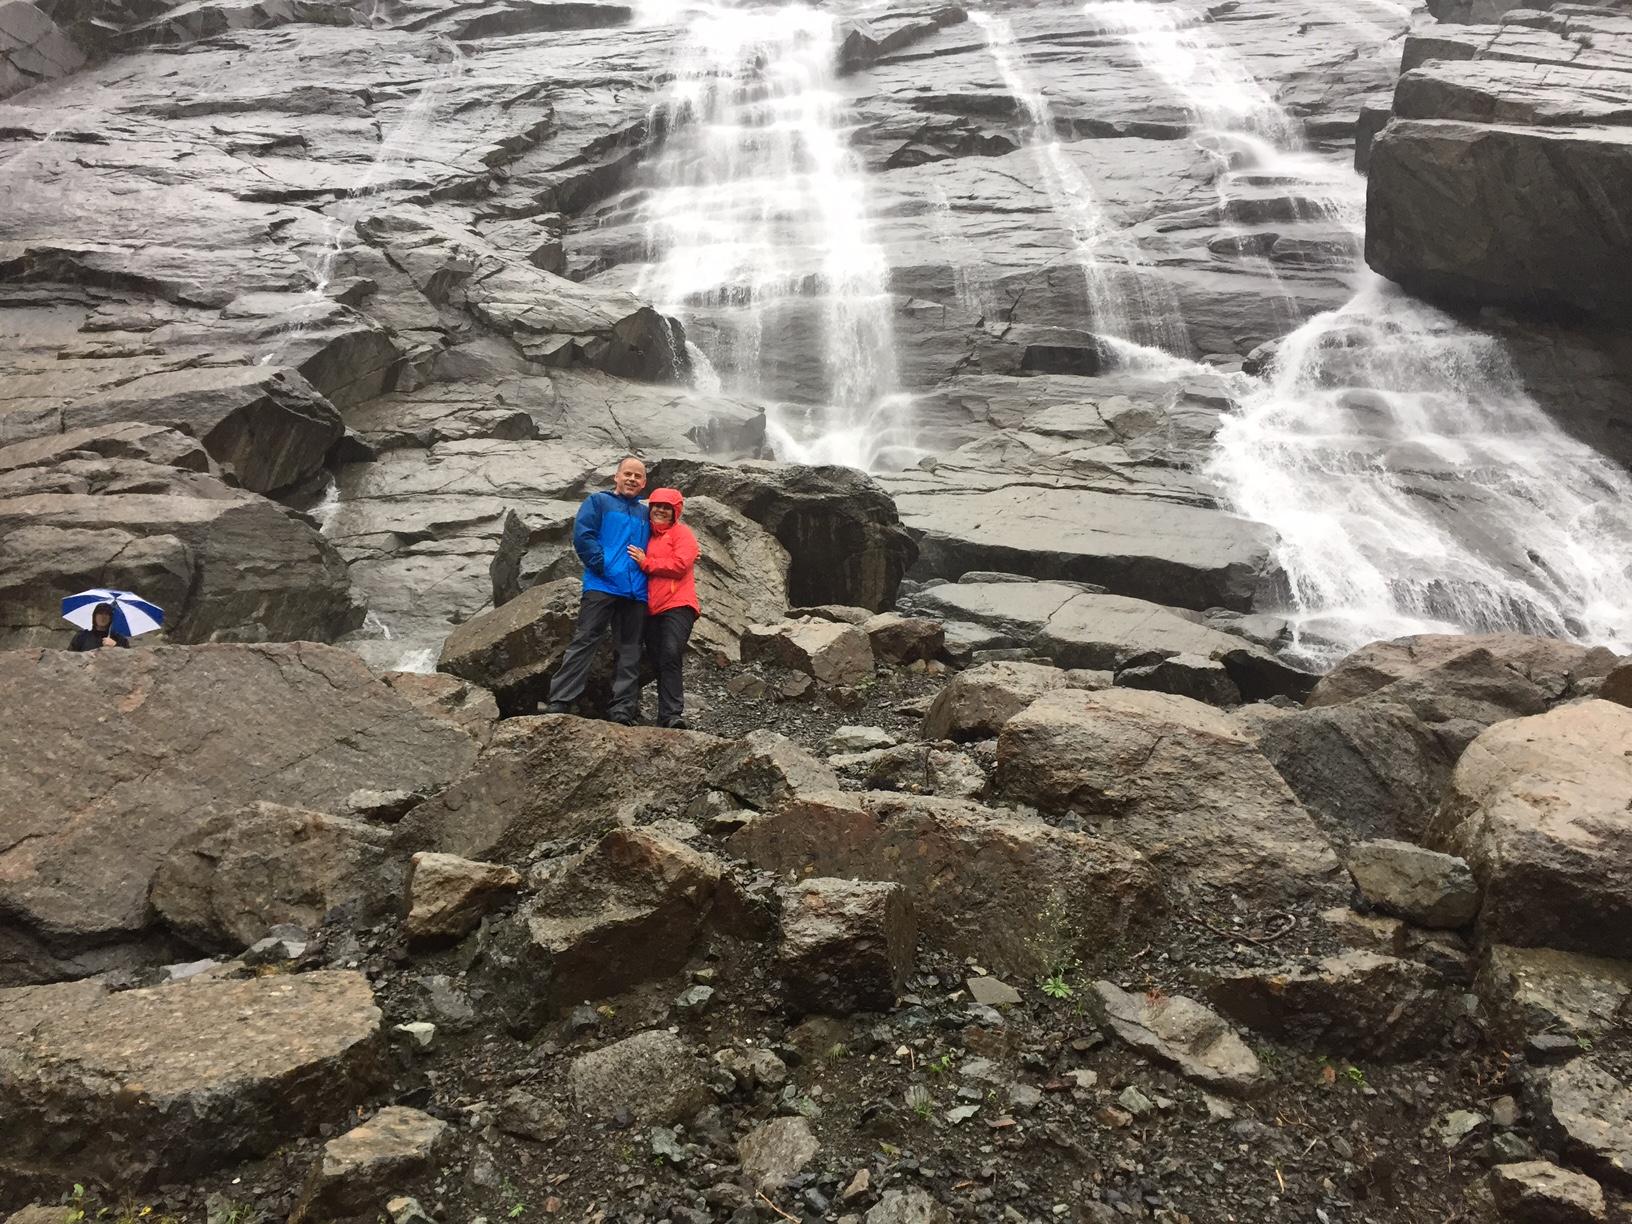 Hiking in Granite Falls - www.stampedwithaloha.com